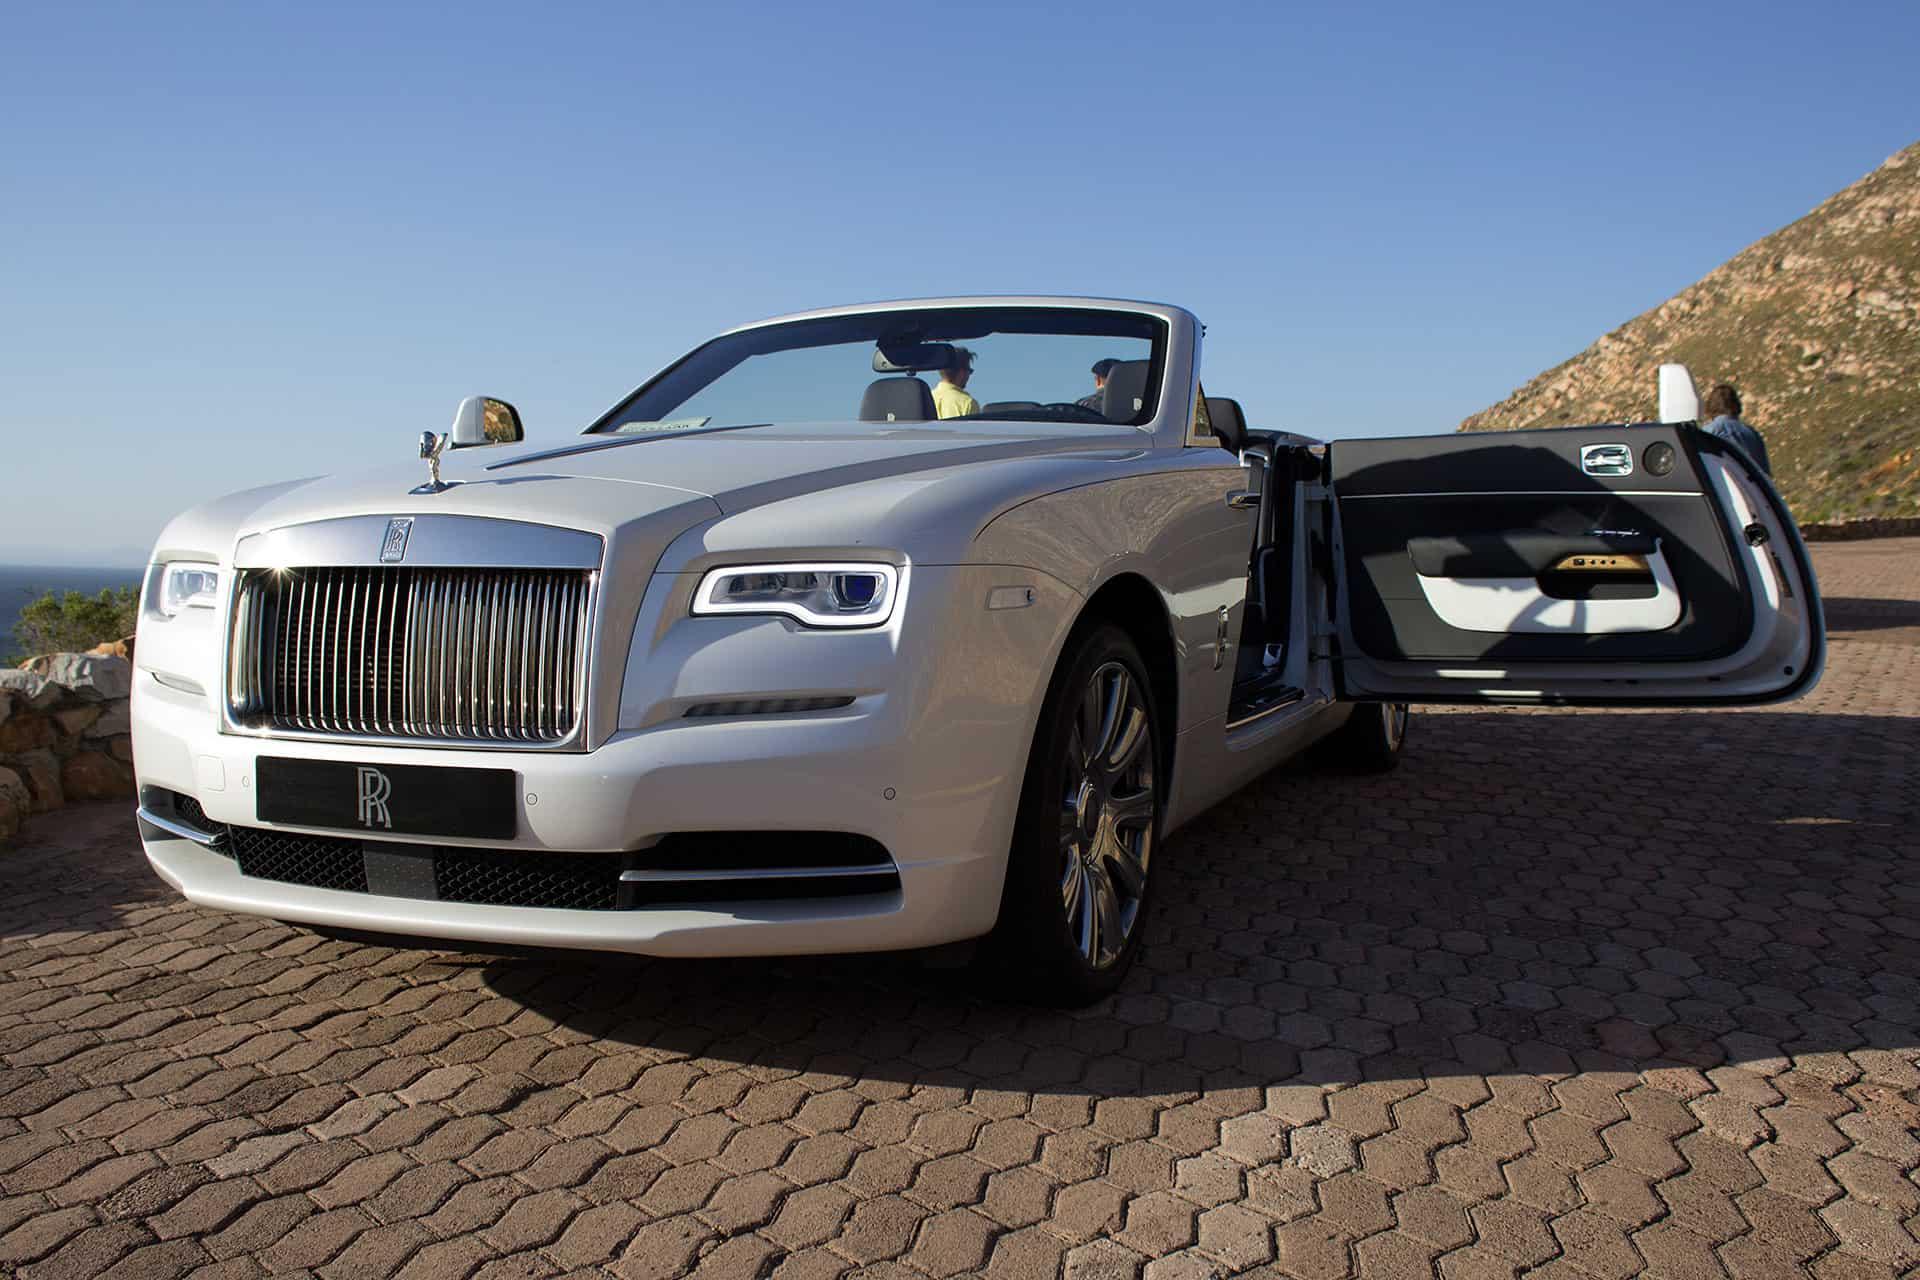 The 2016 Rolls Royce Dawn First Drive